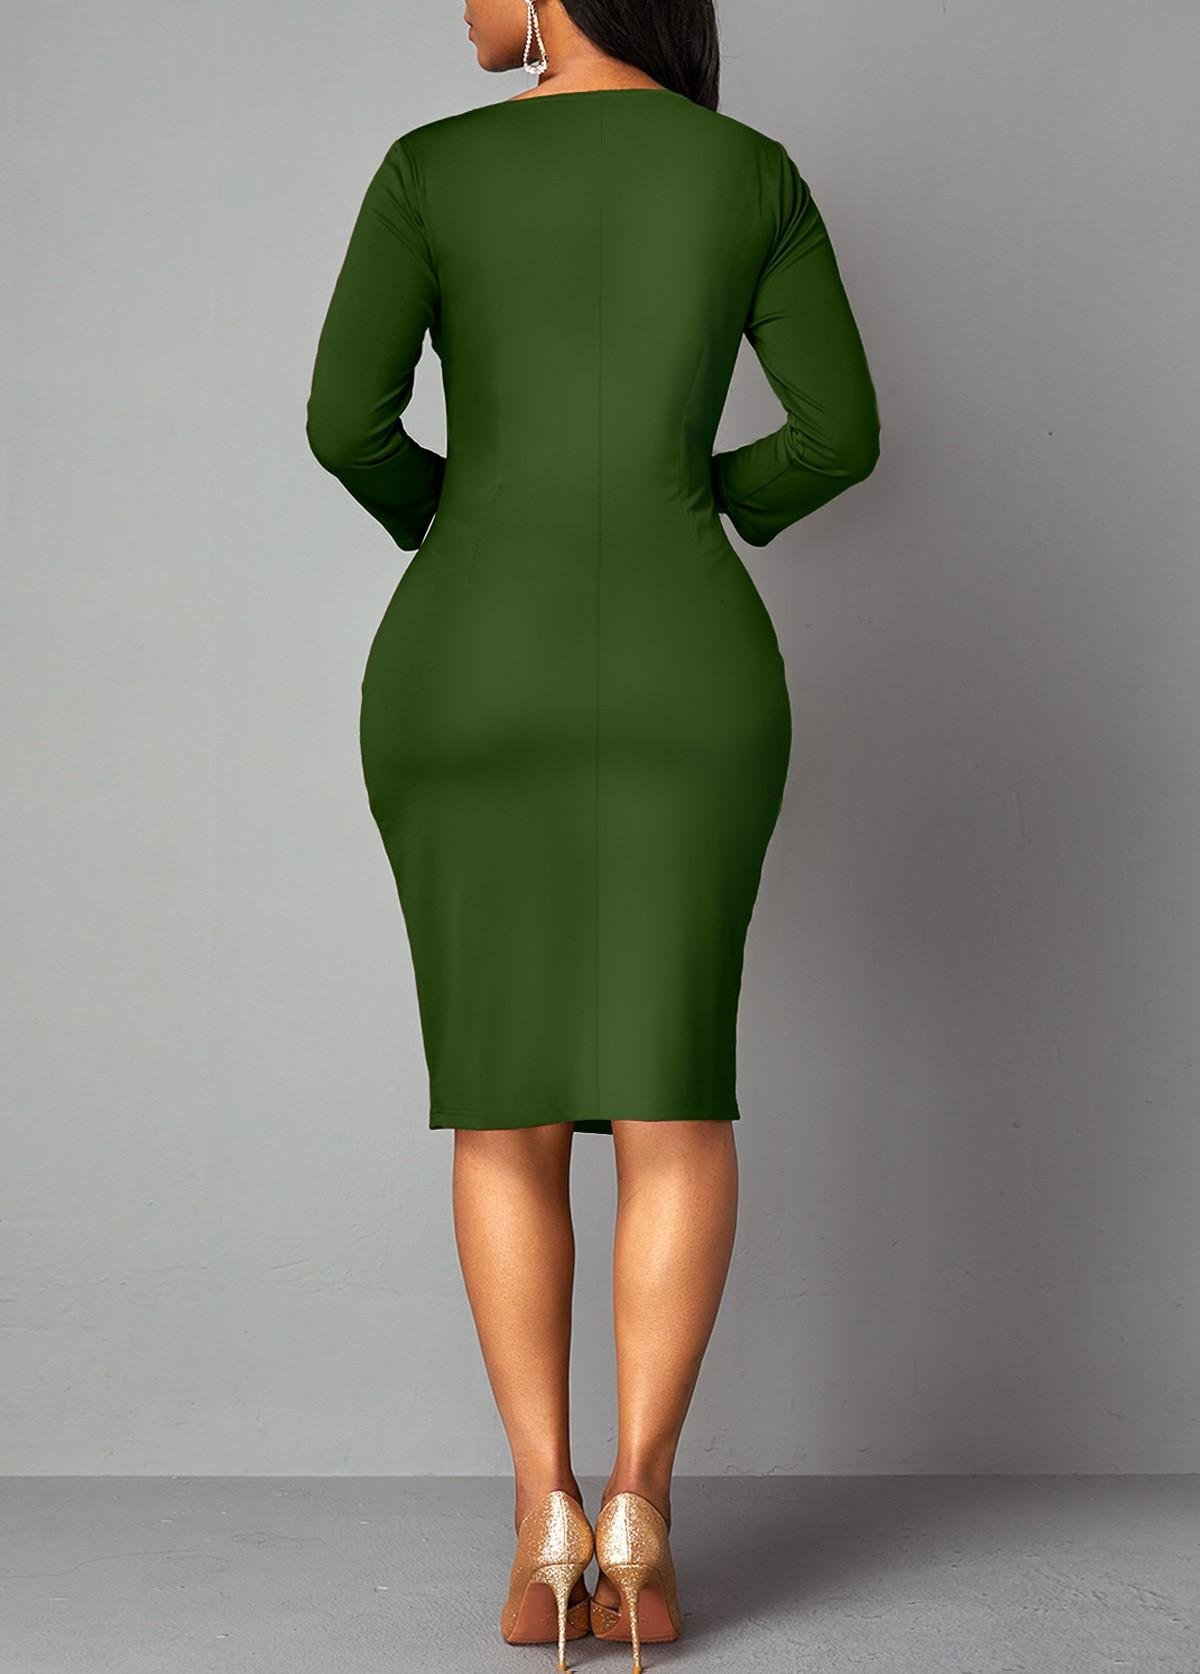 Geometric Print 3/4 Sleeve Sheath Dress